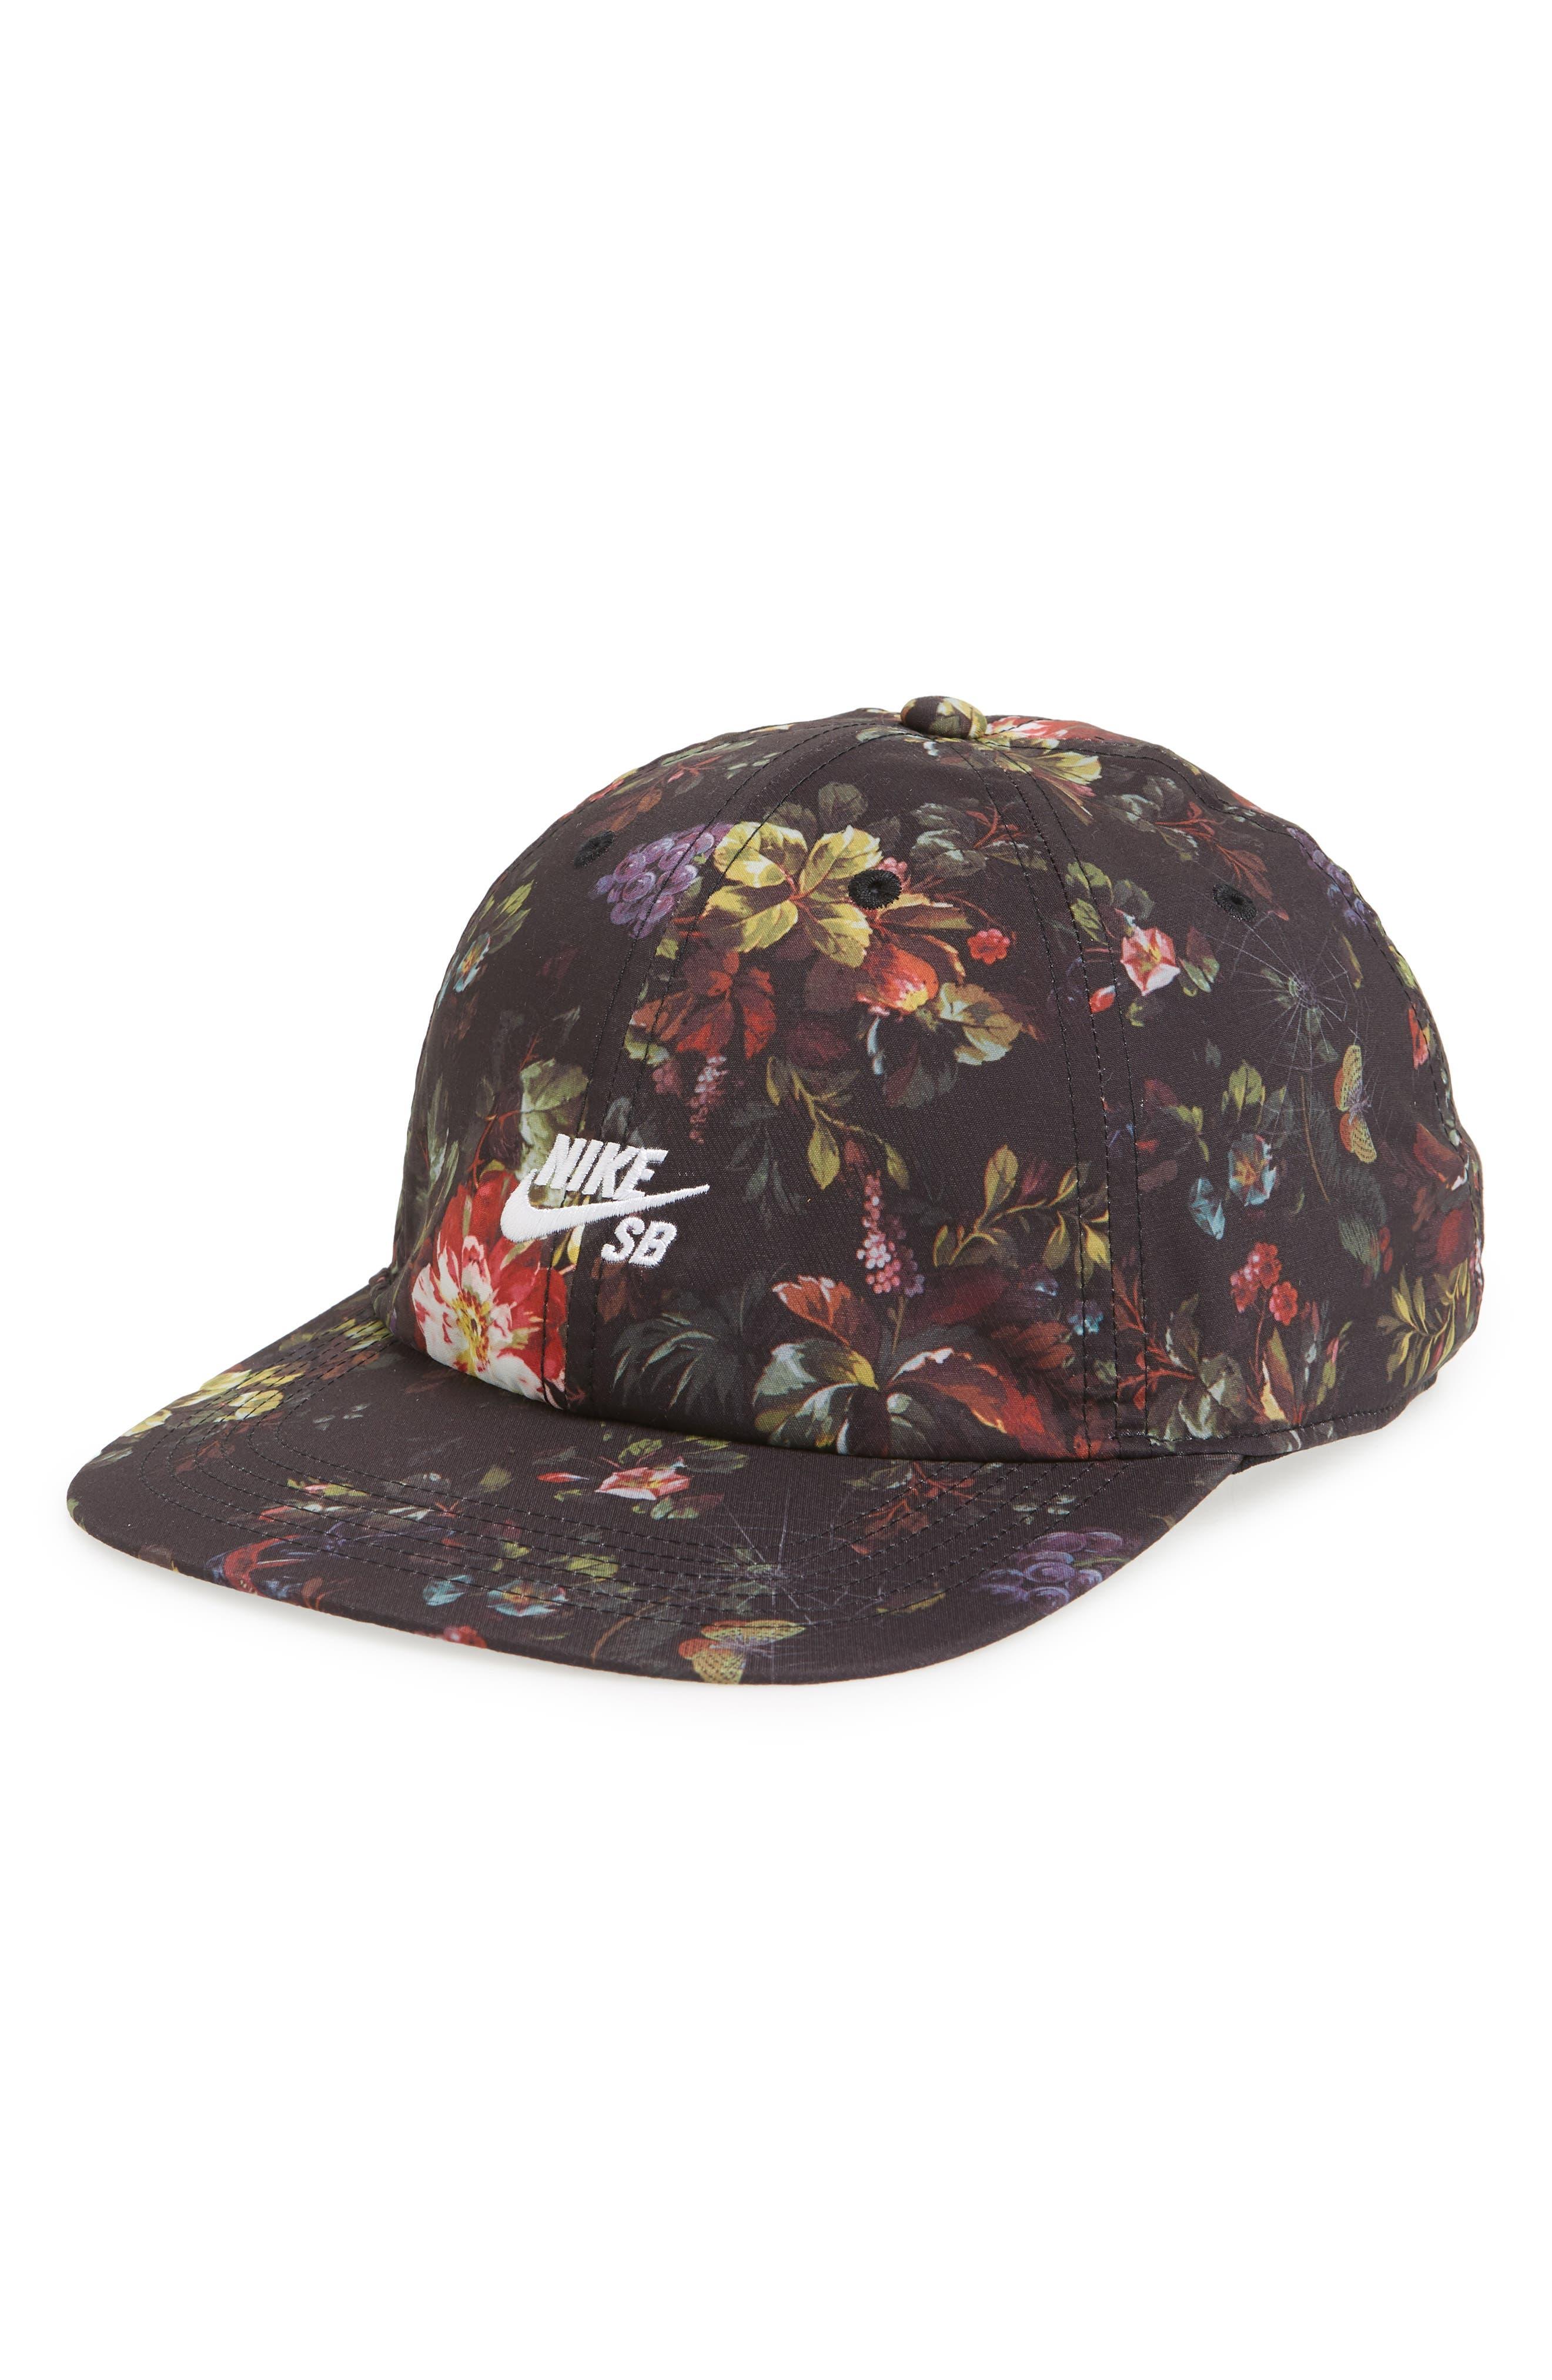 728ff228 ... adjustable hat royal blue fdb7c ed893; closeout nike sb h86 baseball  cap f46ea ff51f